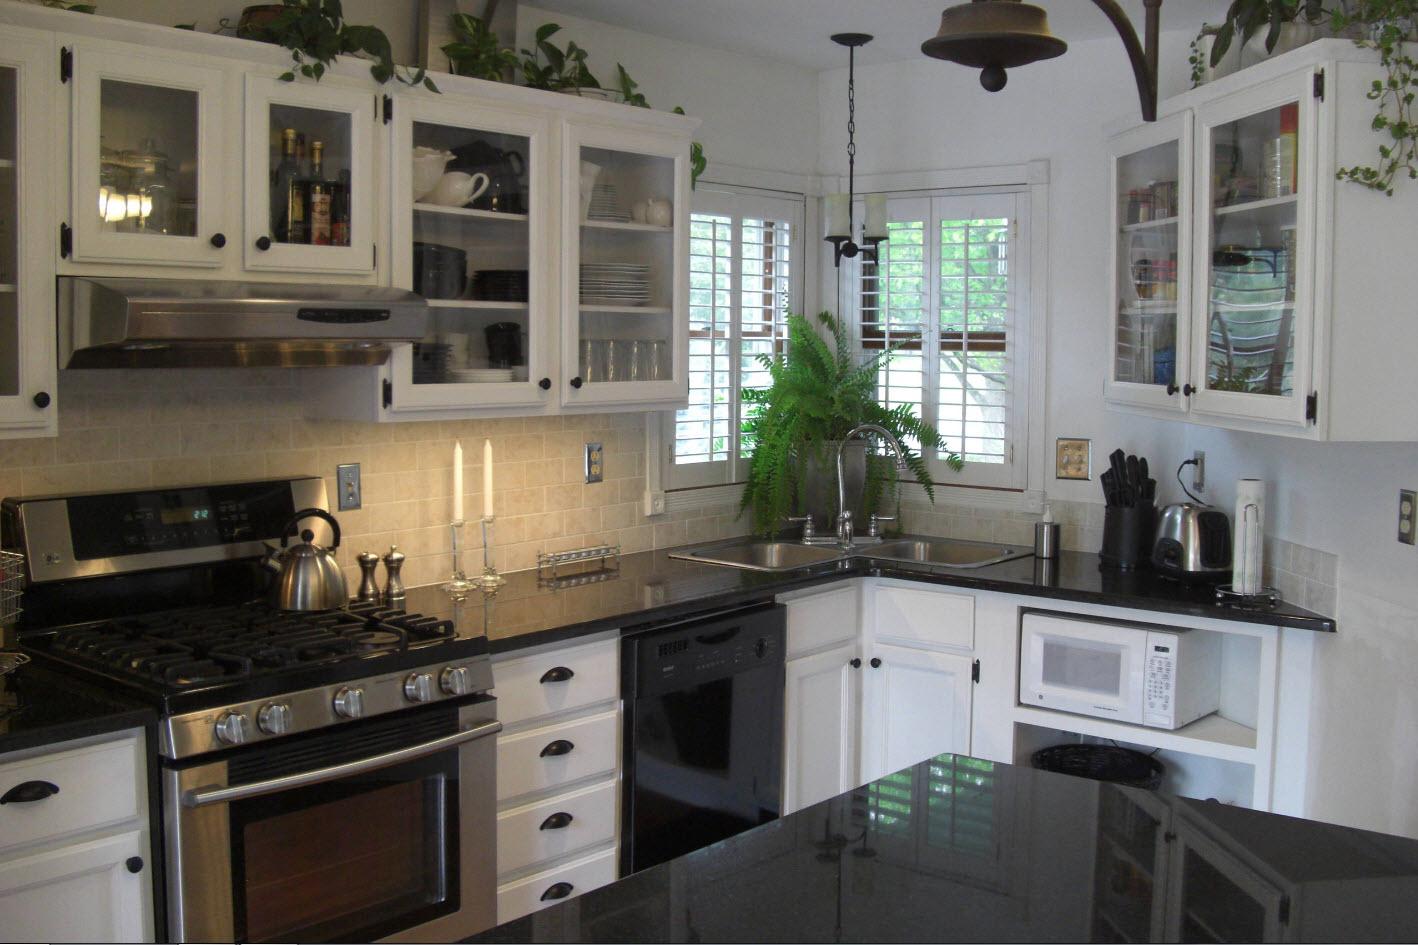 Angular Kitchen Layout Design Ideas 2017. White neat white furniture facades among the dark spots of appliances